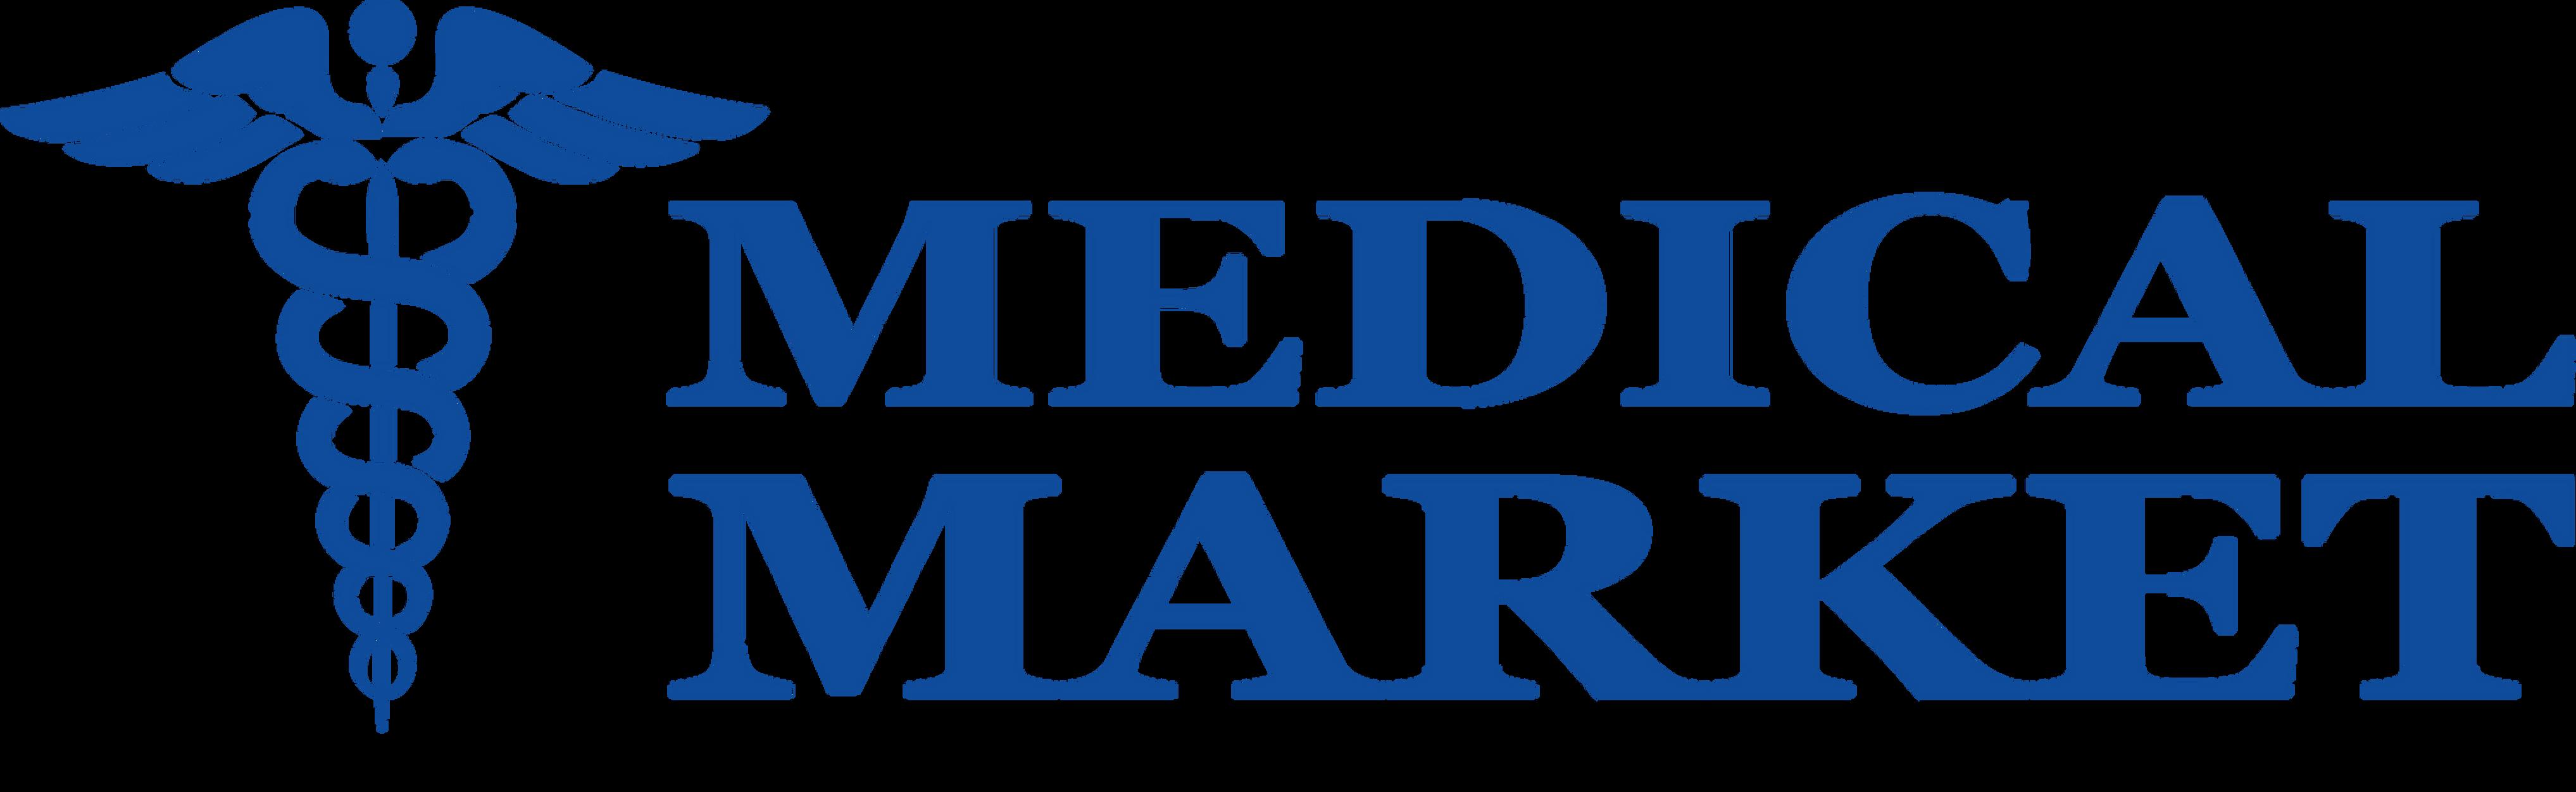 Medical Supply Store in Almaden & Modesto, CA | Medical Market